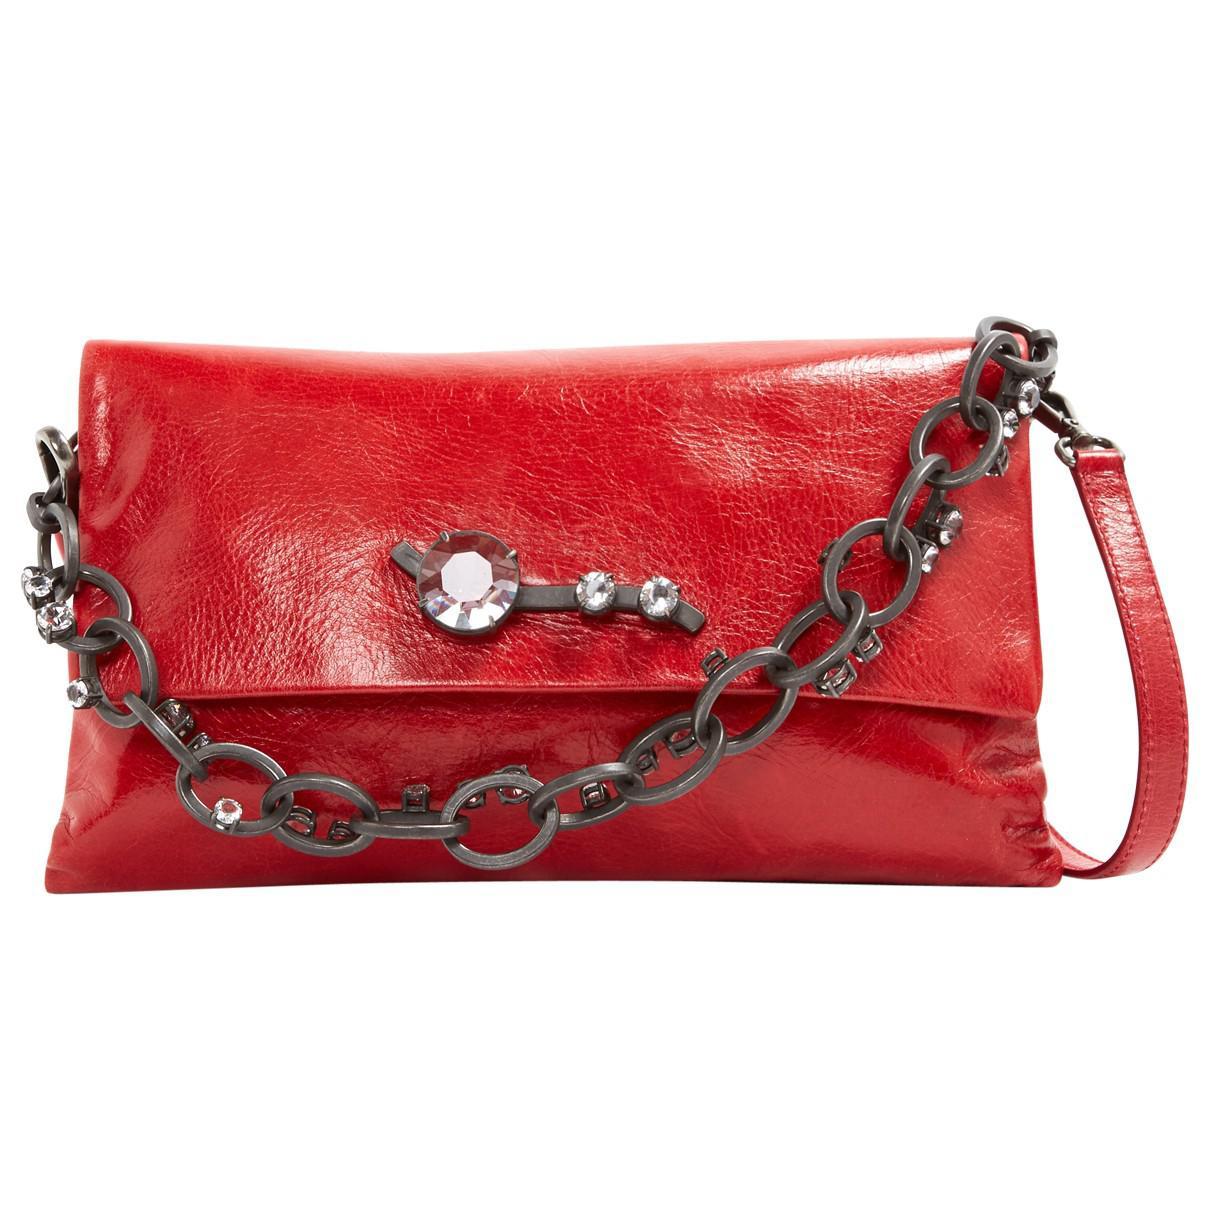 Pre-owned - Mini bag Miu Miu HewOj